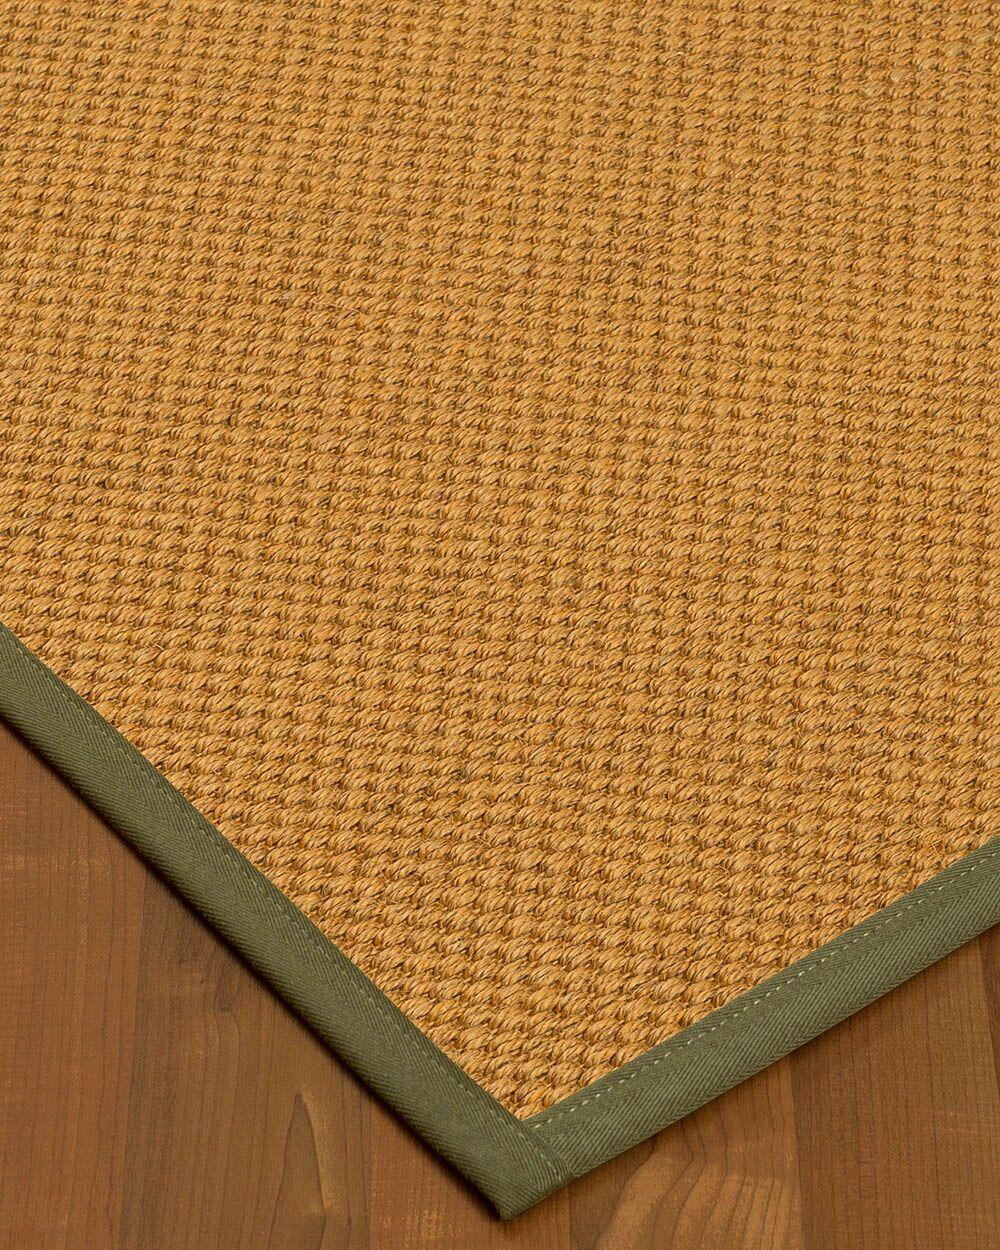 Halter Hand-Woven Beige Area Rug Rug Size: Rectangle 3' x 5'